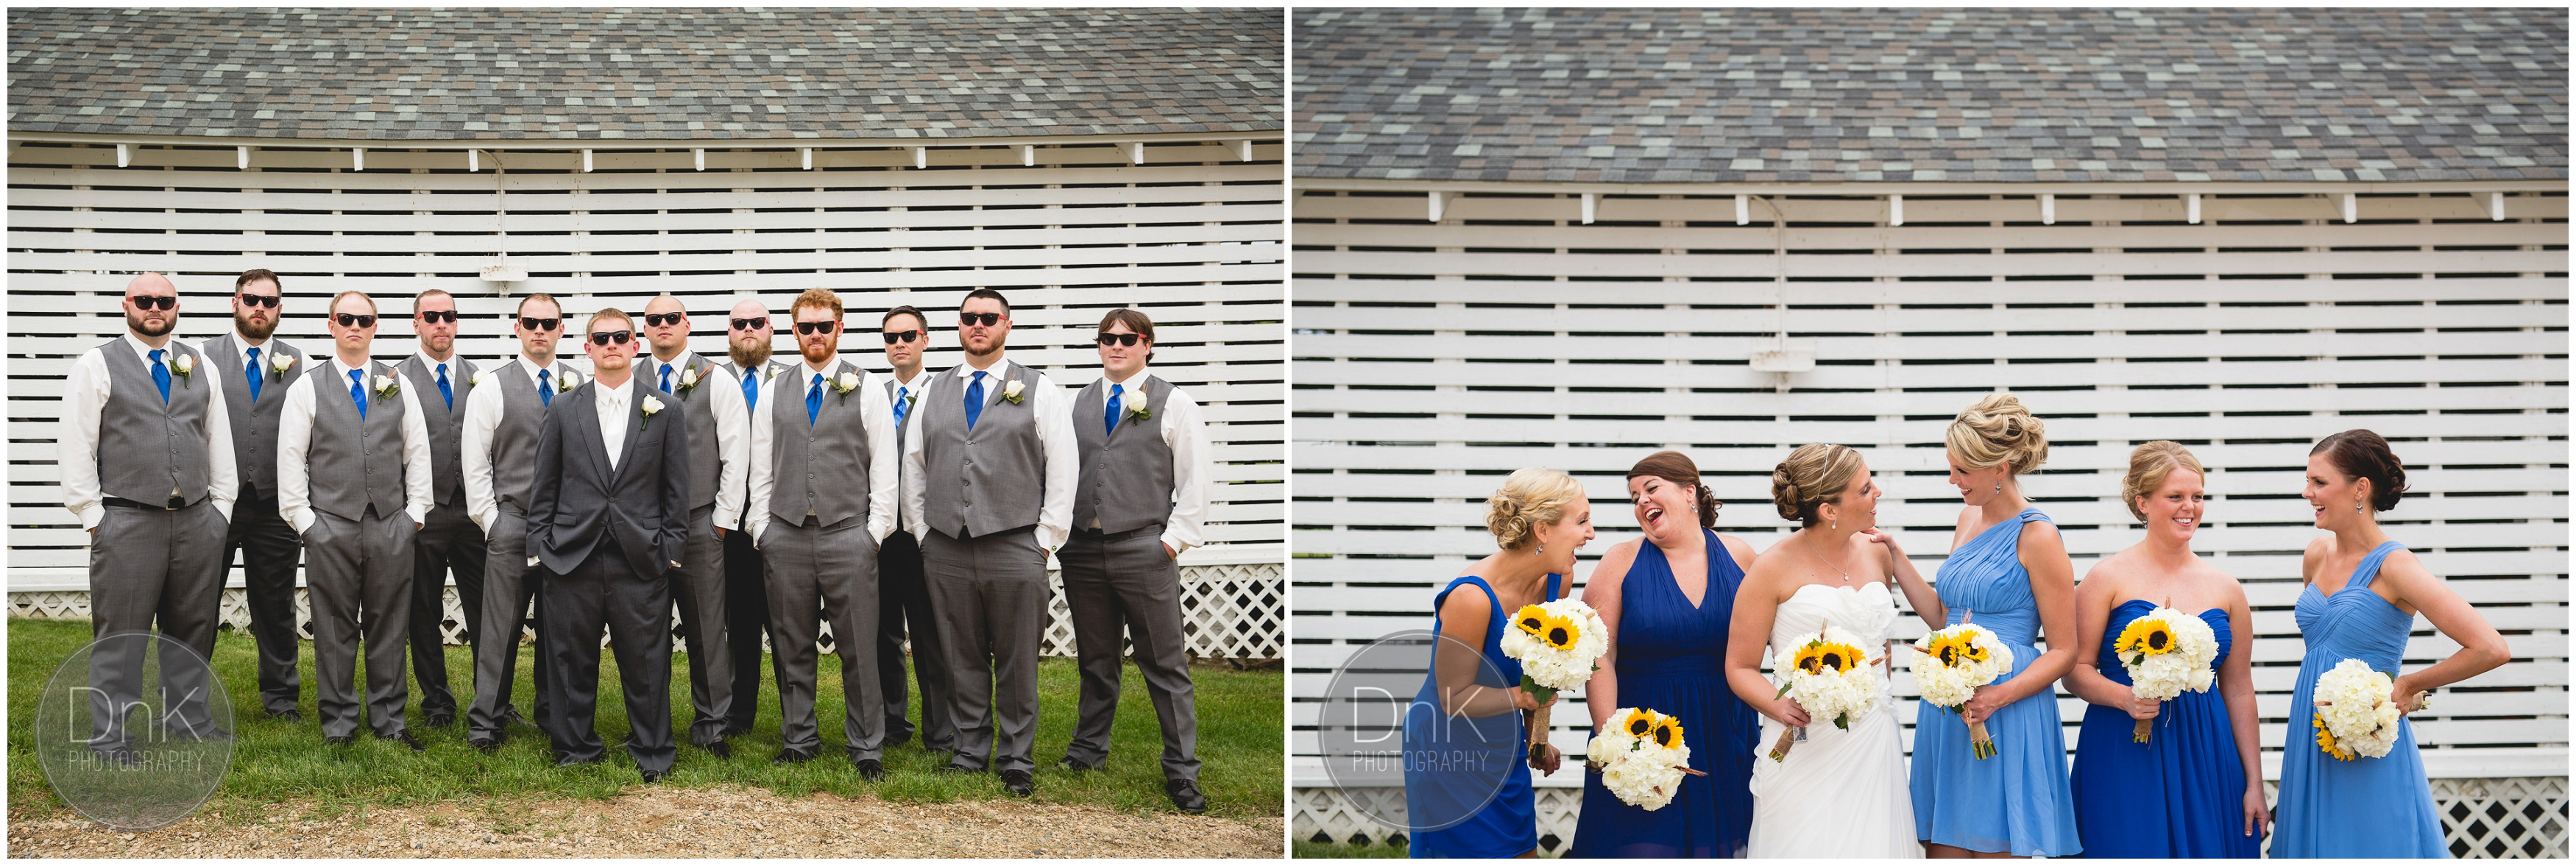 13- Dellwood Barn Wedding Photographer